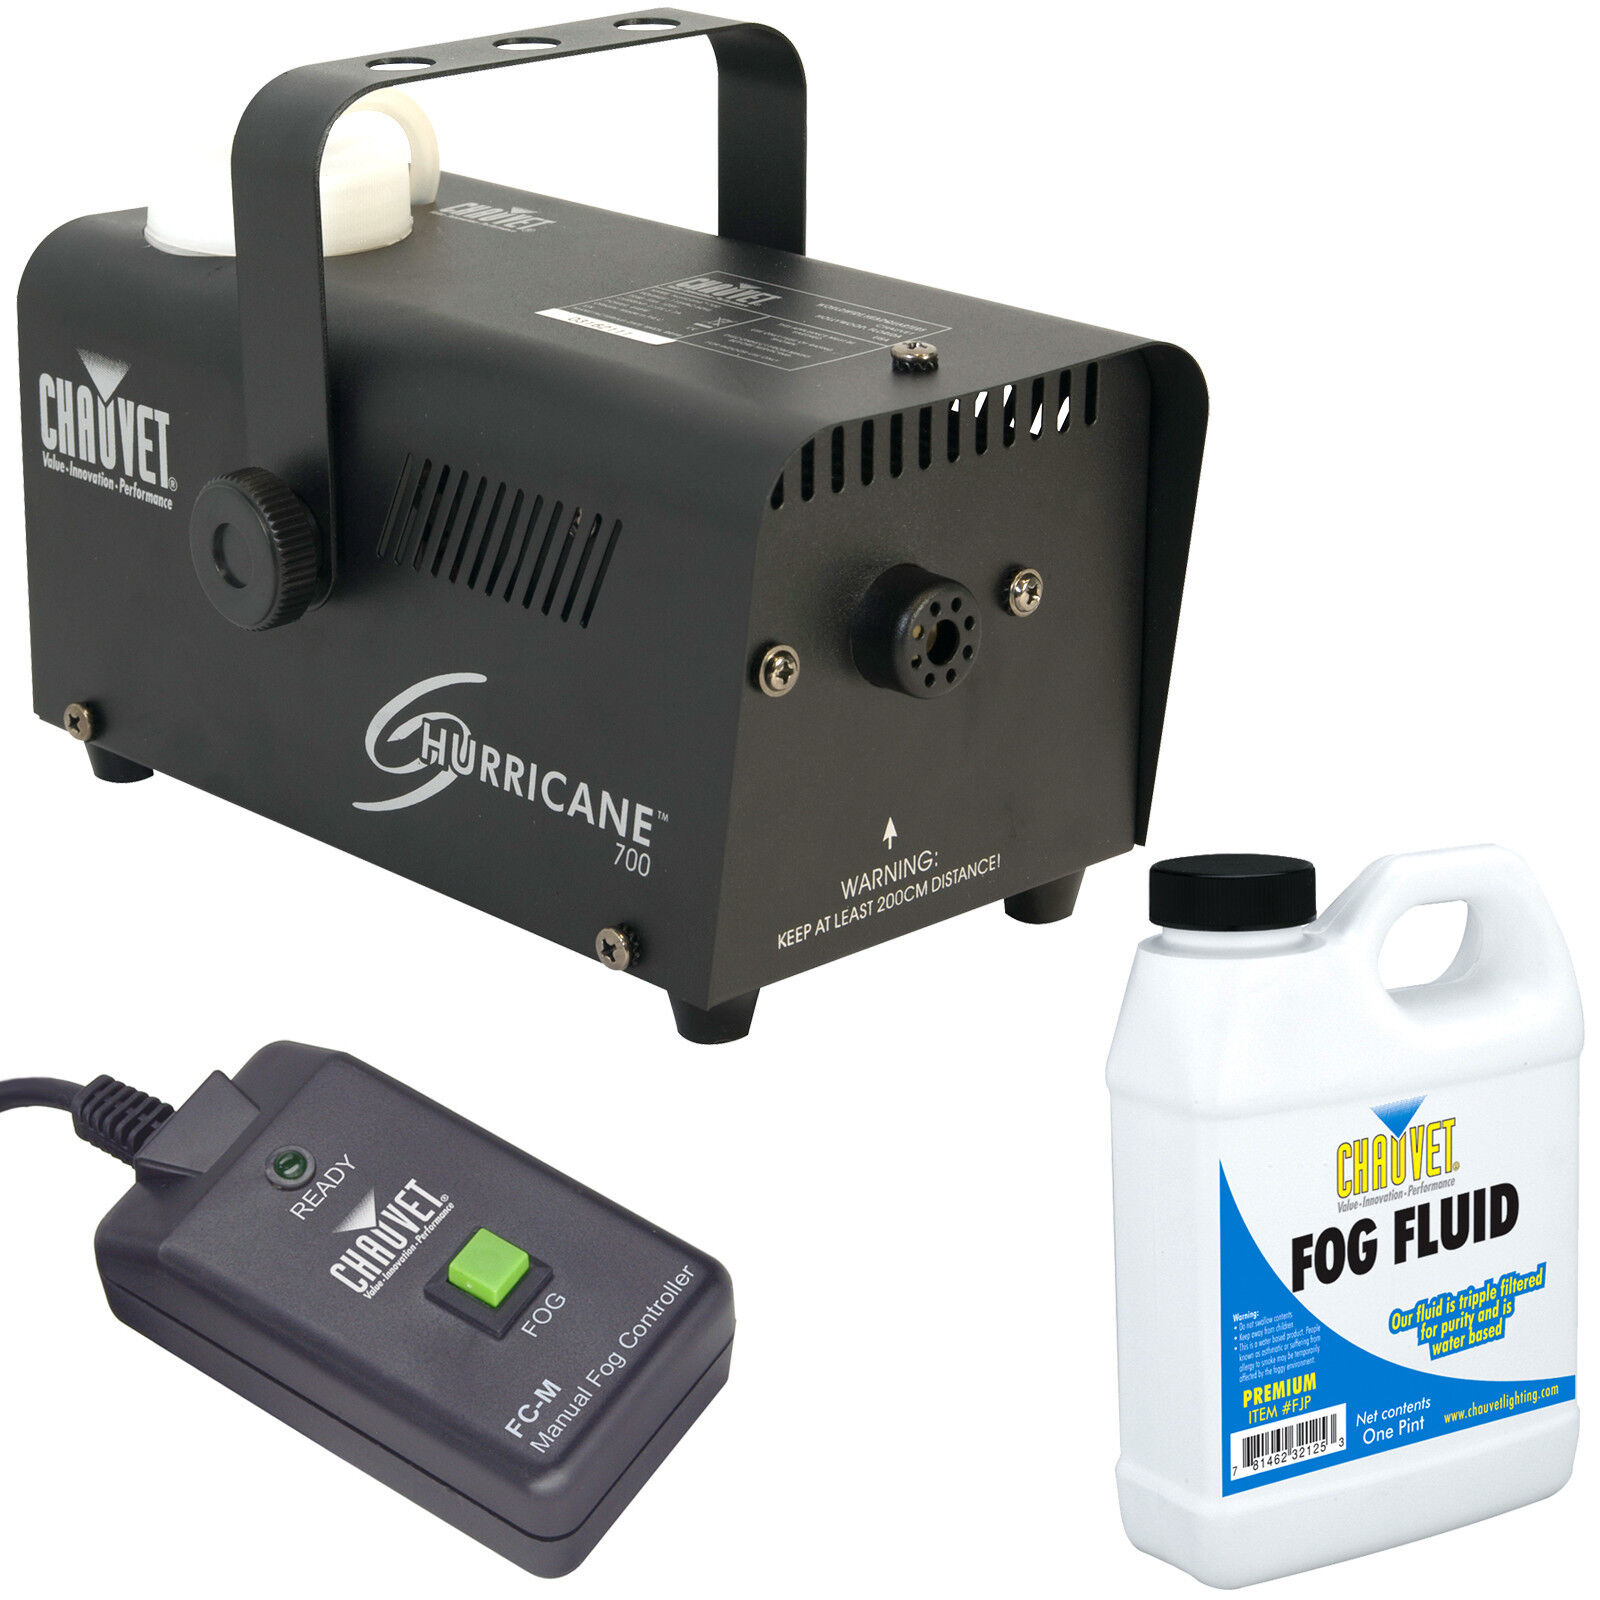 Купить Chauvet Hurricane 700 - Chauvet H-700 Hurricane 700 Halloween Fog/Smoke Machine with Fluid & Remote